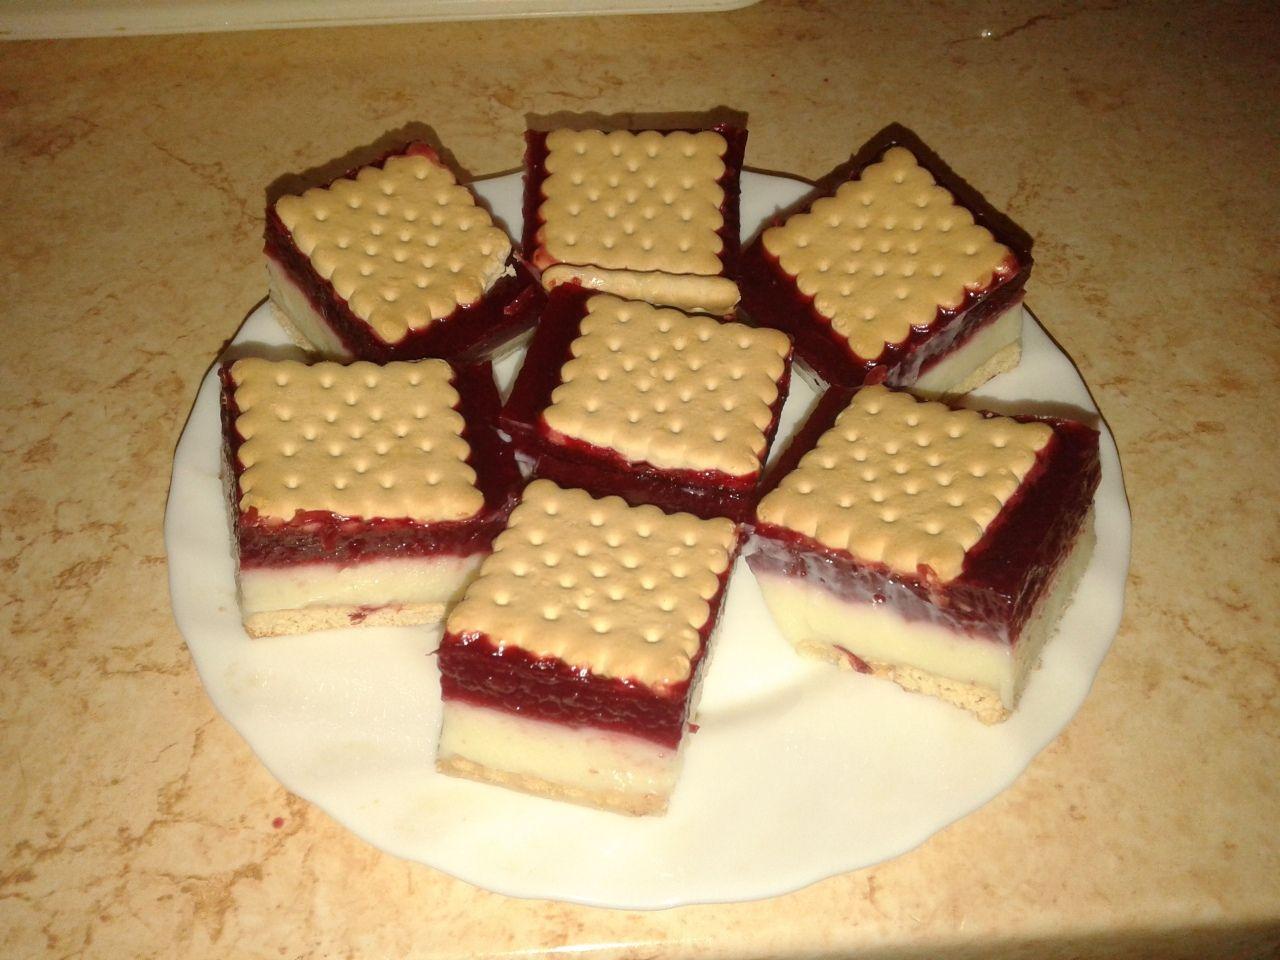 Meggyes-pudingos kekszcsoda